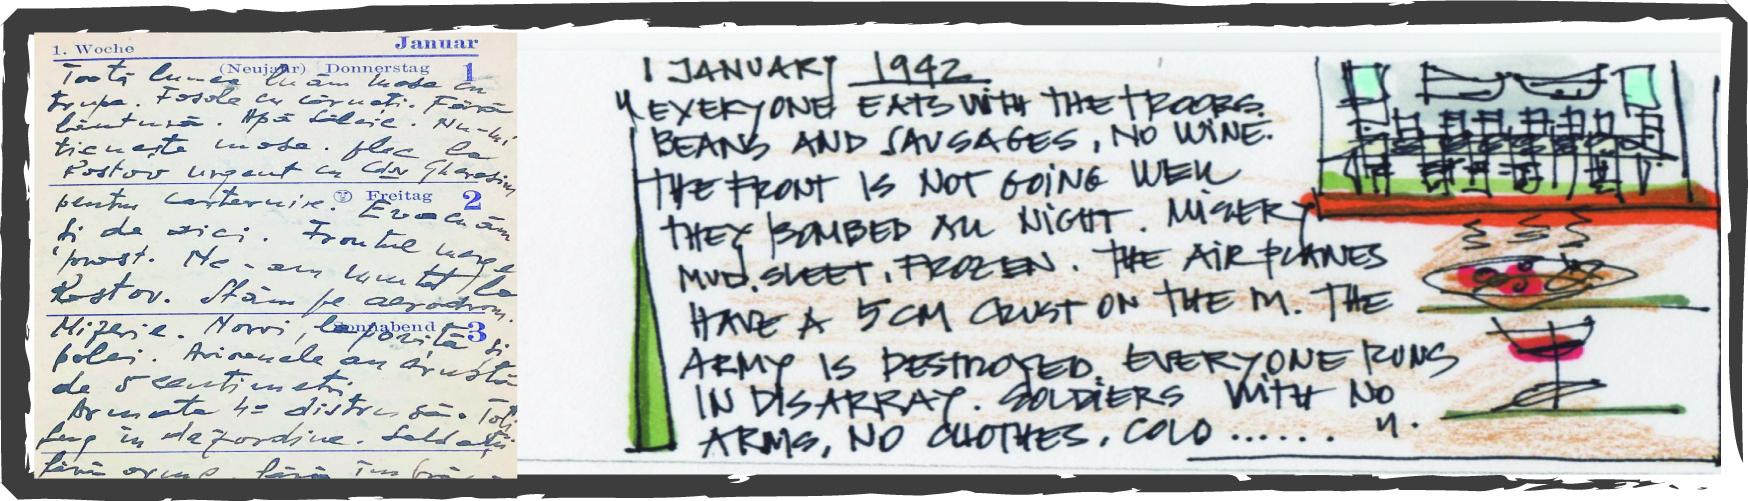 january 1,1942